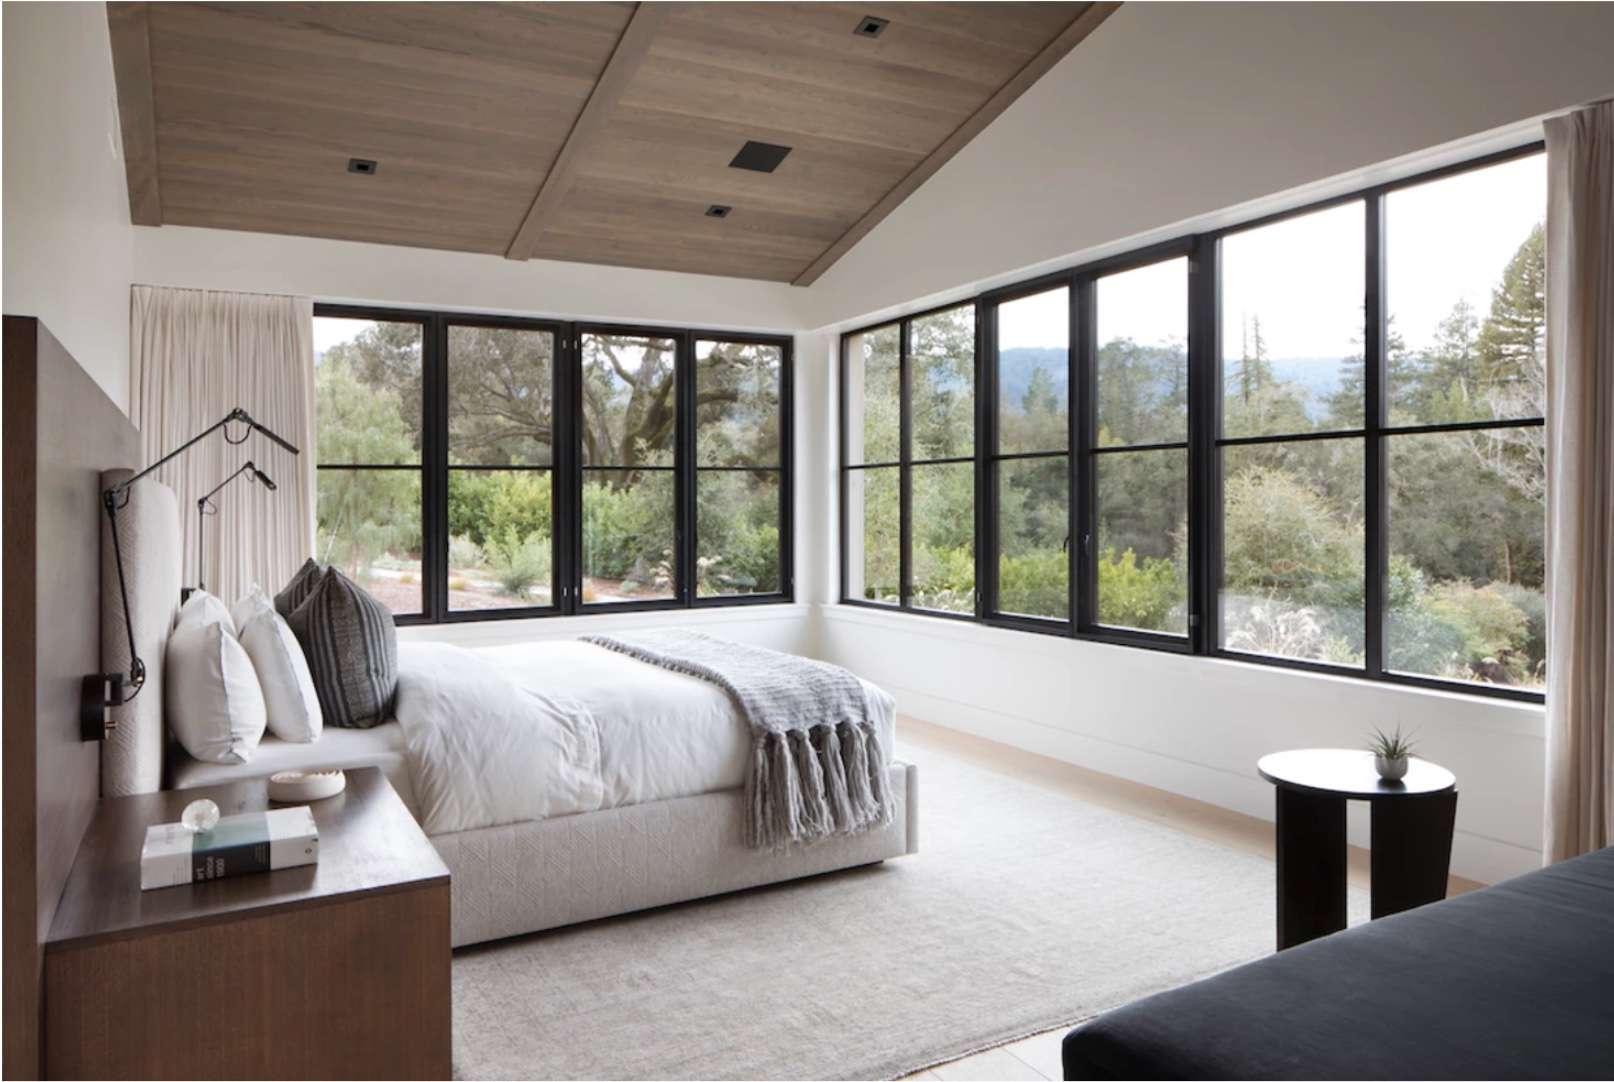 Kendall wilkinson bedroom